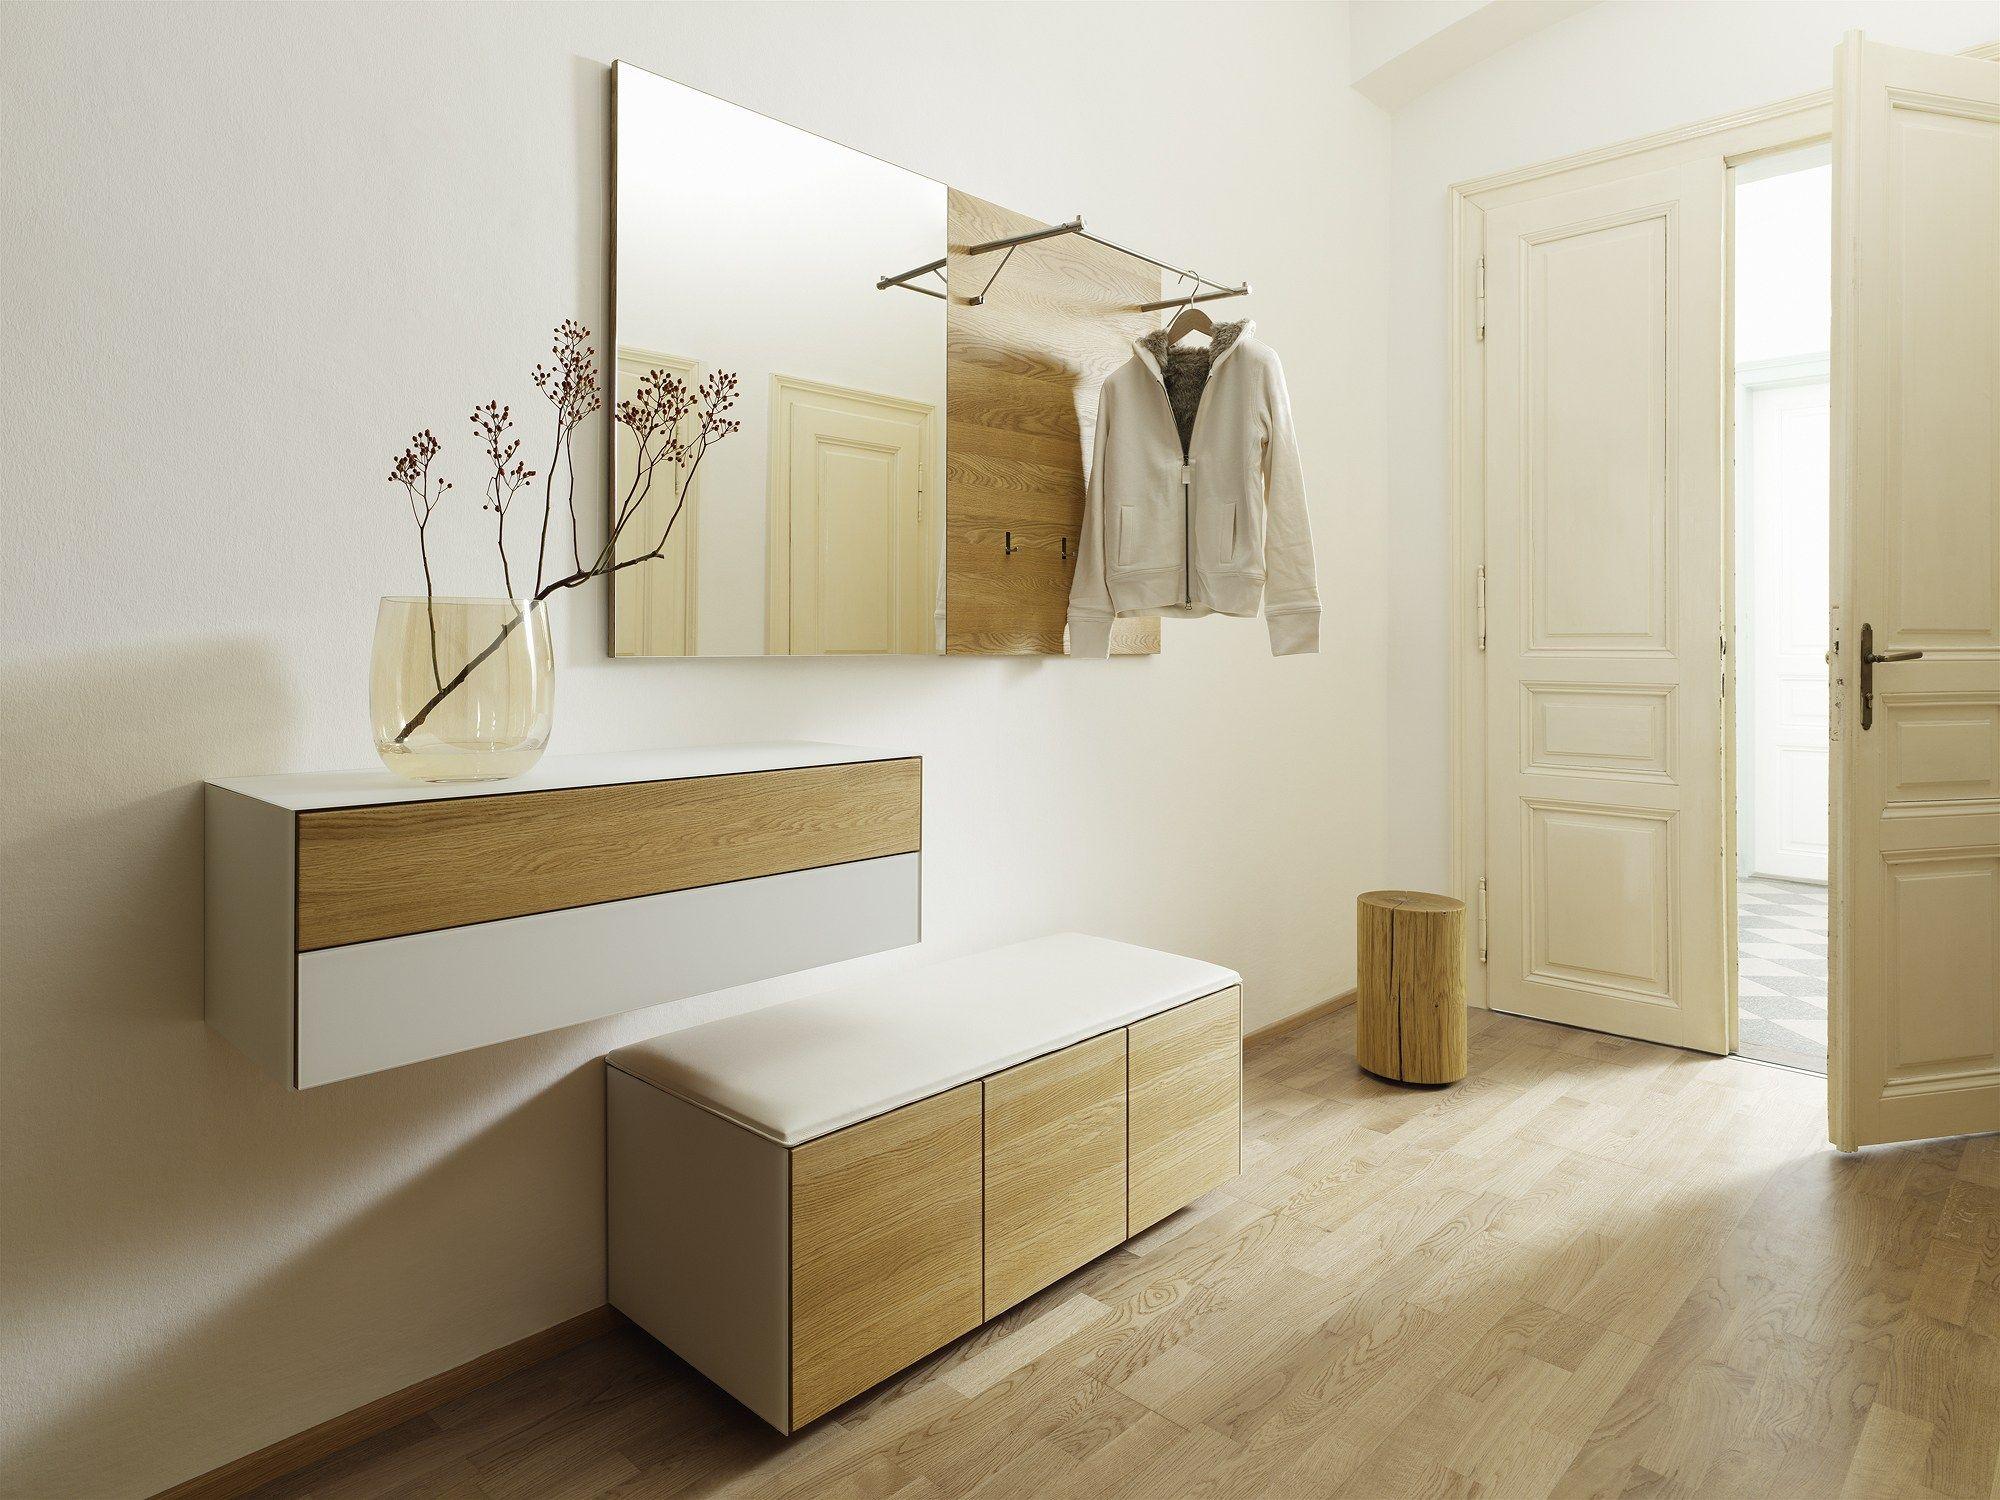 Sectional wall-mounted hallway unit CUBUS PURE Cubus Pure Collection by TEAM 7 Natürlich Wohnen | design Sebastian Desch